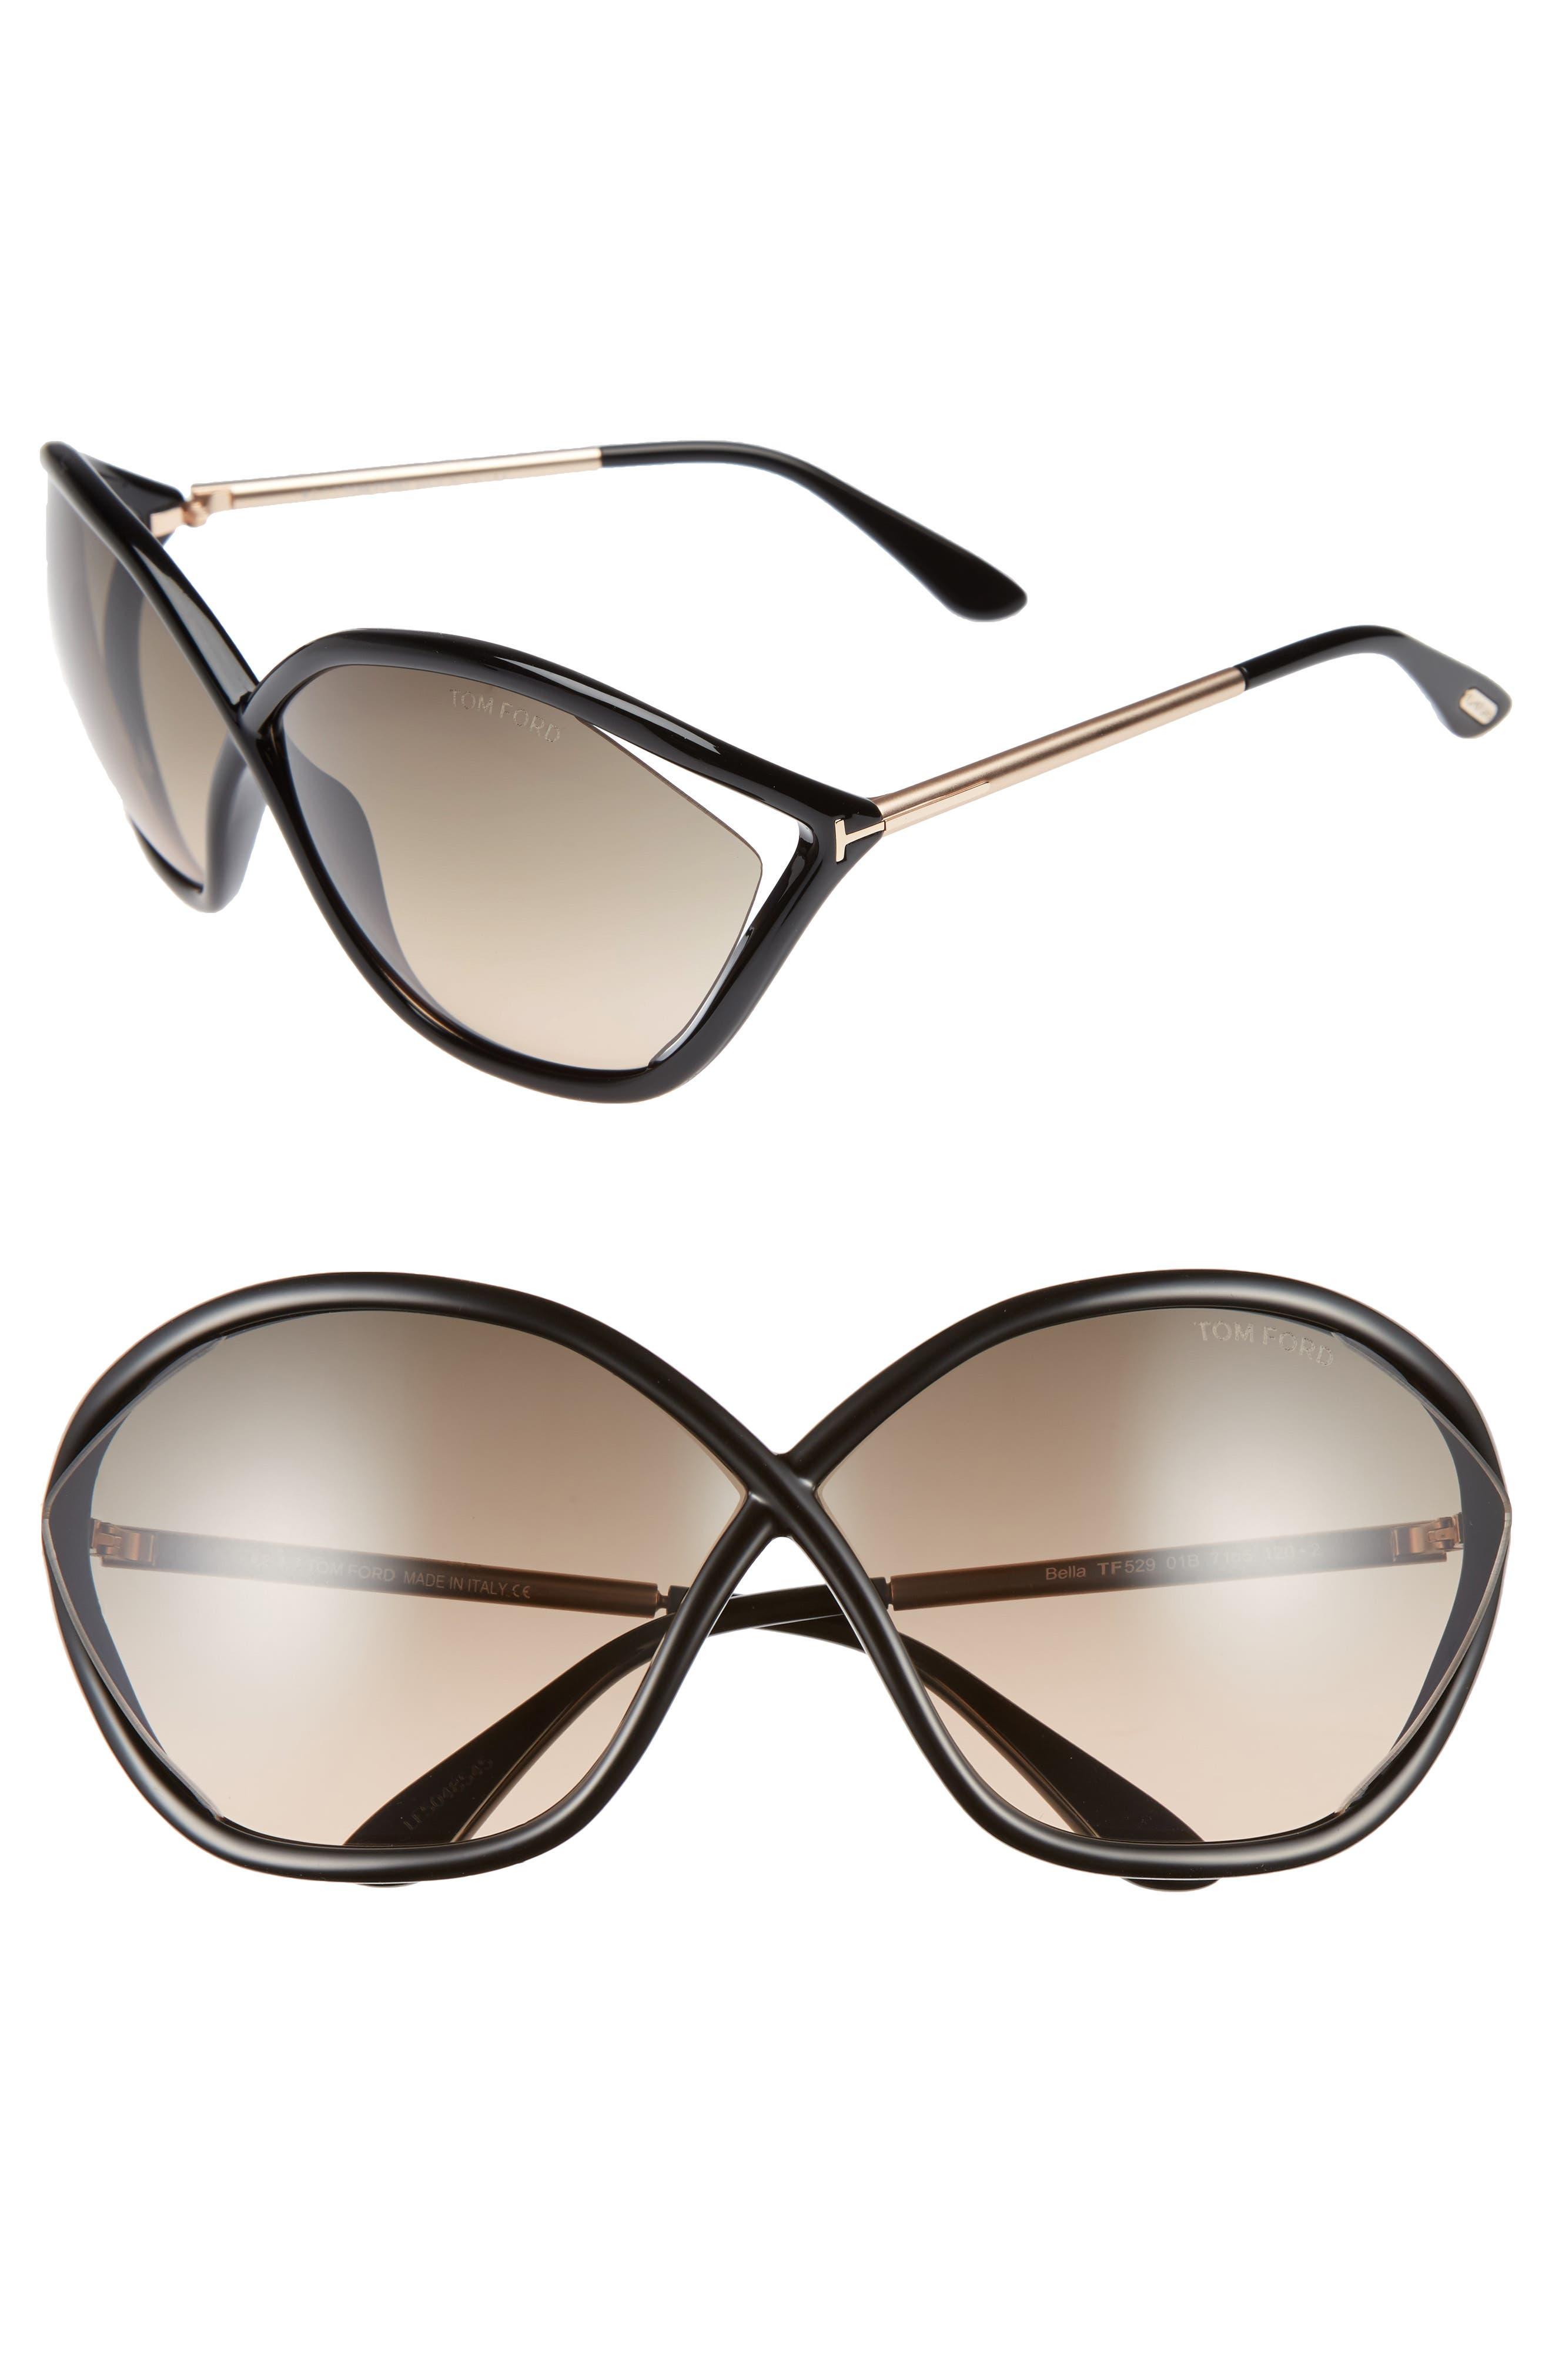 Bella 71mm Gradient Lens Sunglasses,                             Main thumbnail 1, color,                             001